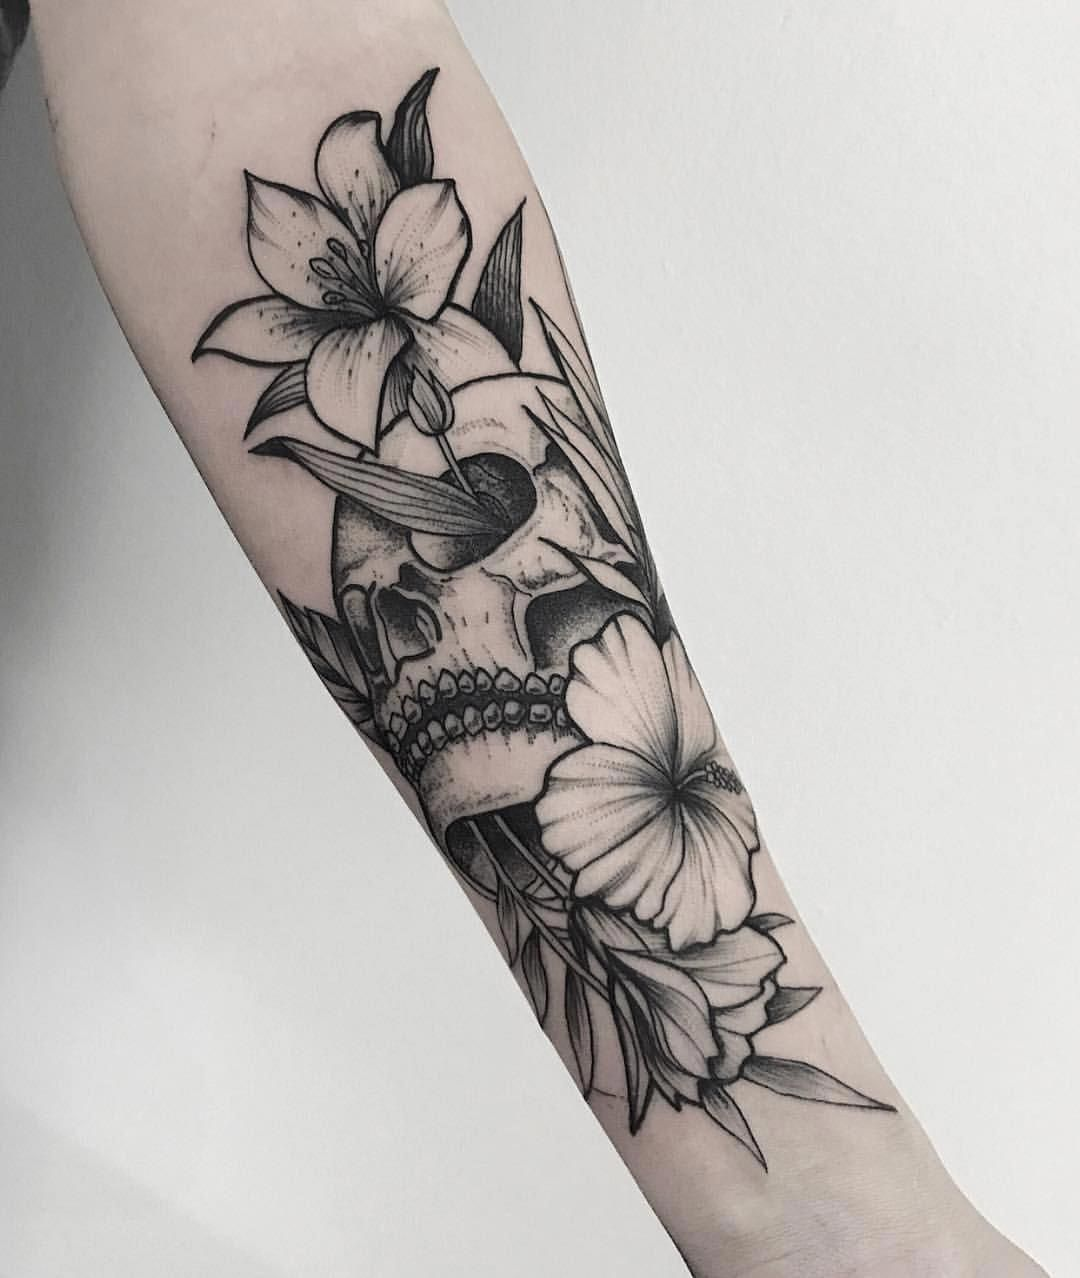 Dotwork Flower Azalea Ricardogarciatattoo Tattoosforwomen Half Sleeve Tattoos Drawings Skull Sleeve Tattoos Unique Half Sleeve Tattoos